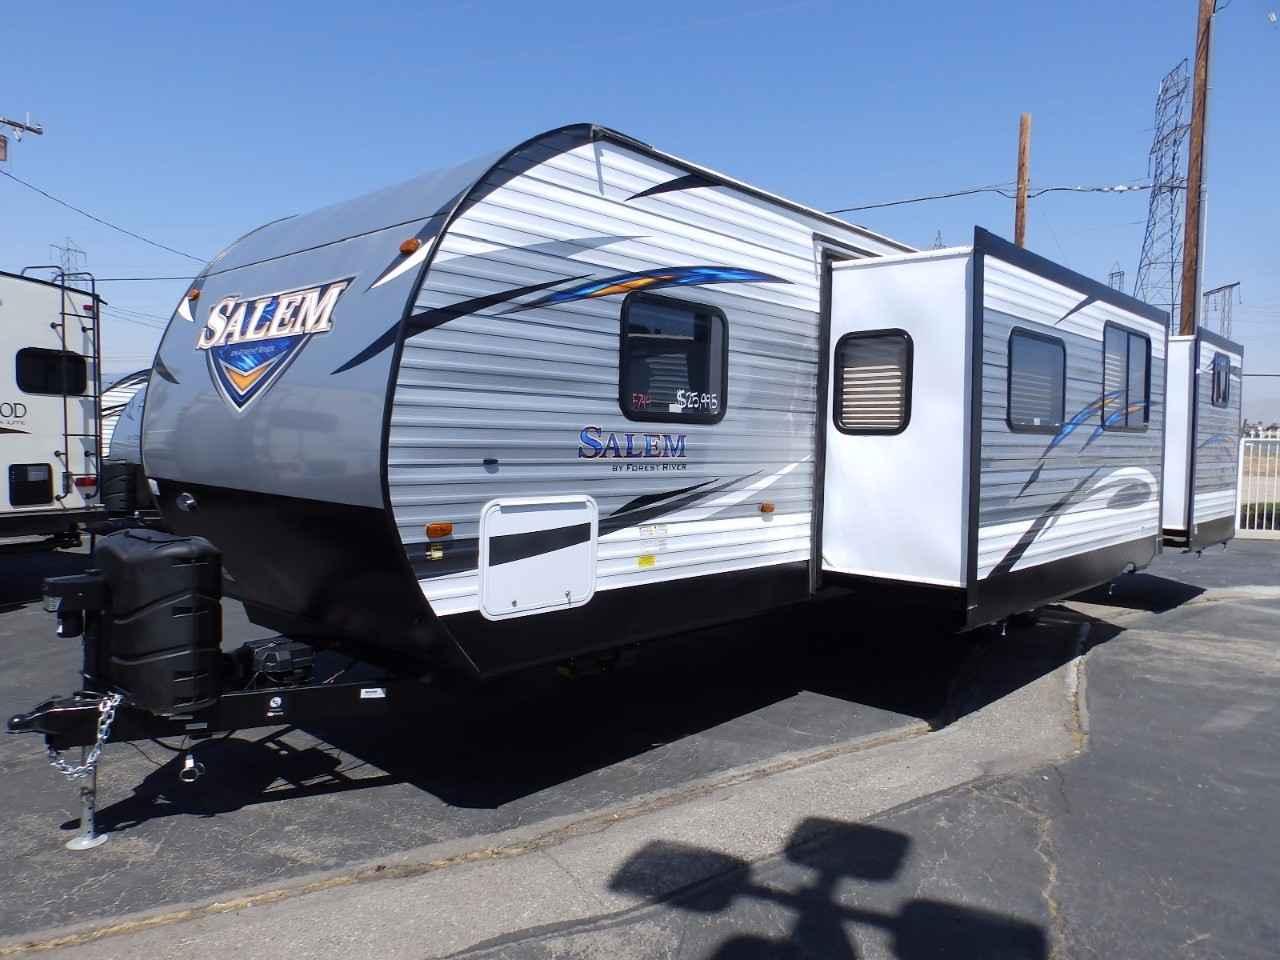 travel trailers with rear kitchen modern sinks 2018 new forest river salem 32bhds 2 slides exterior